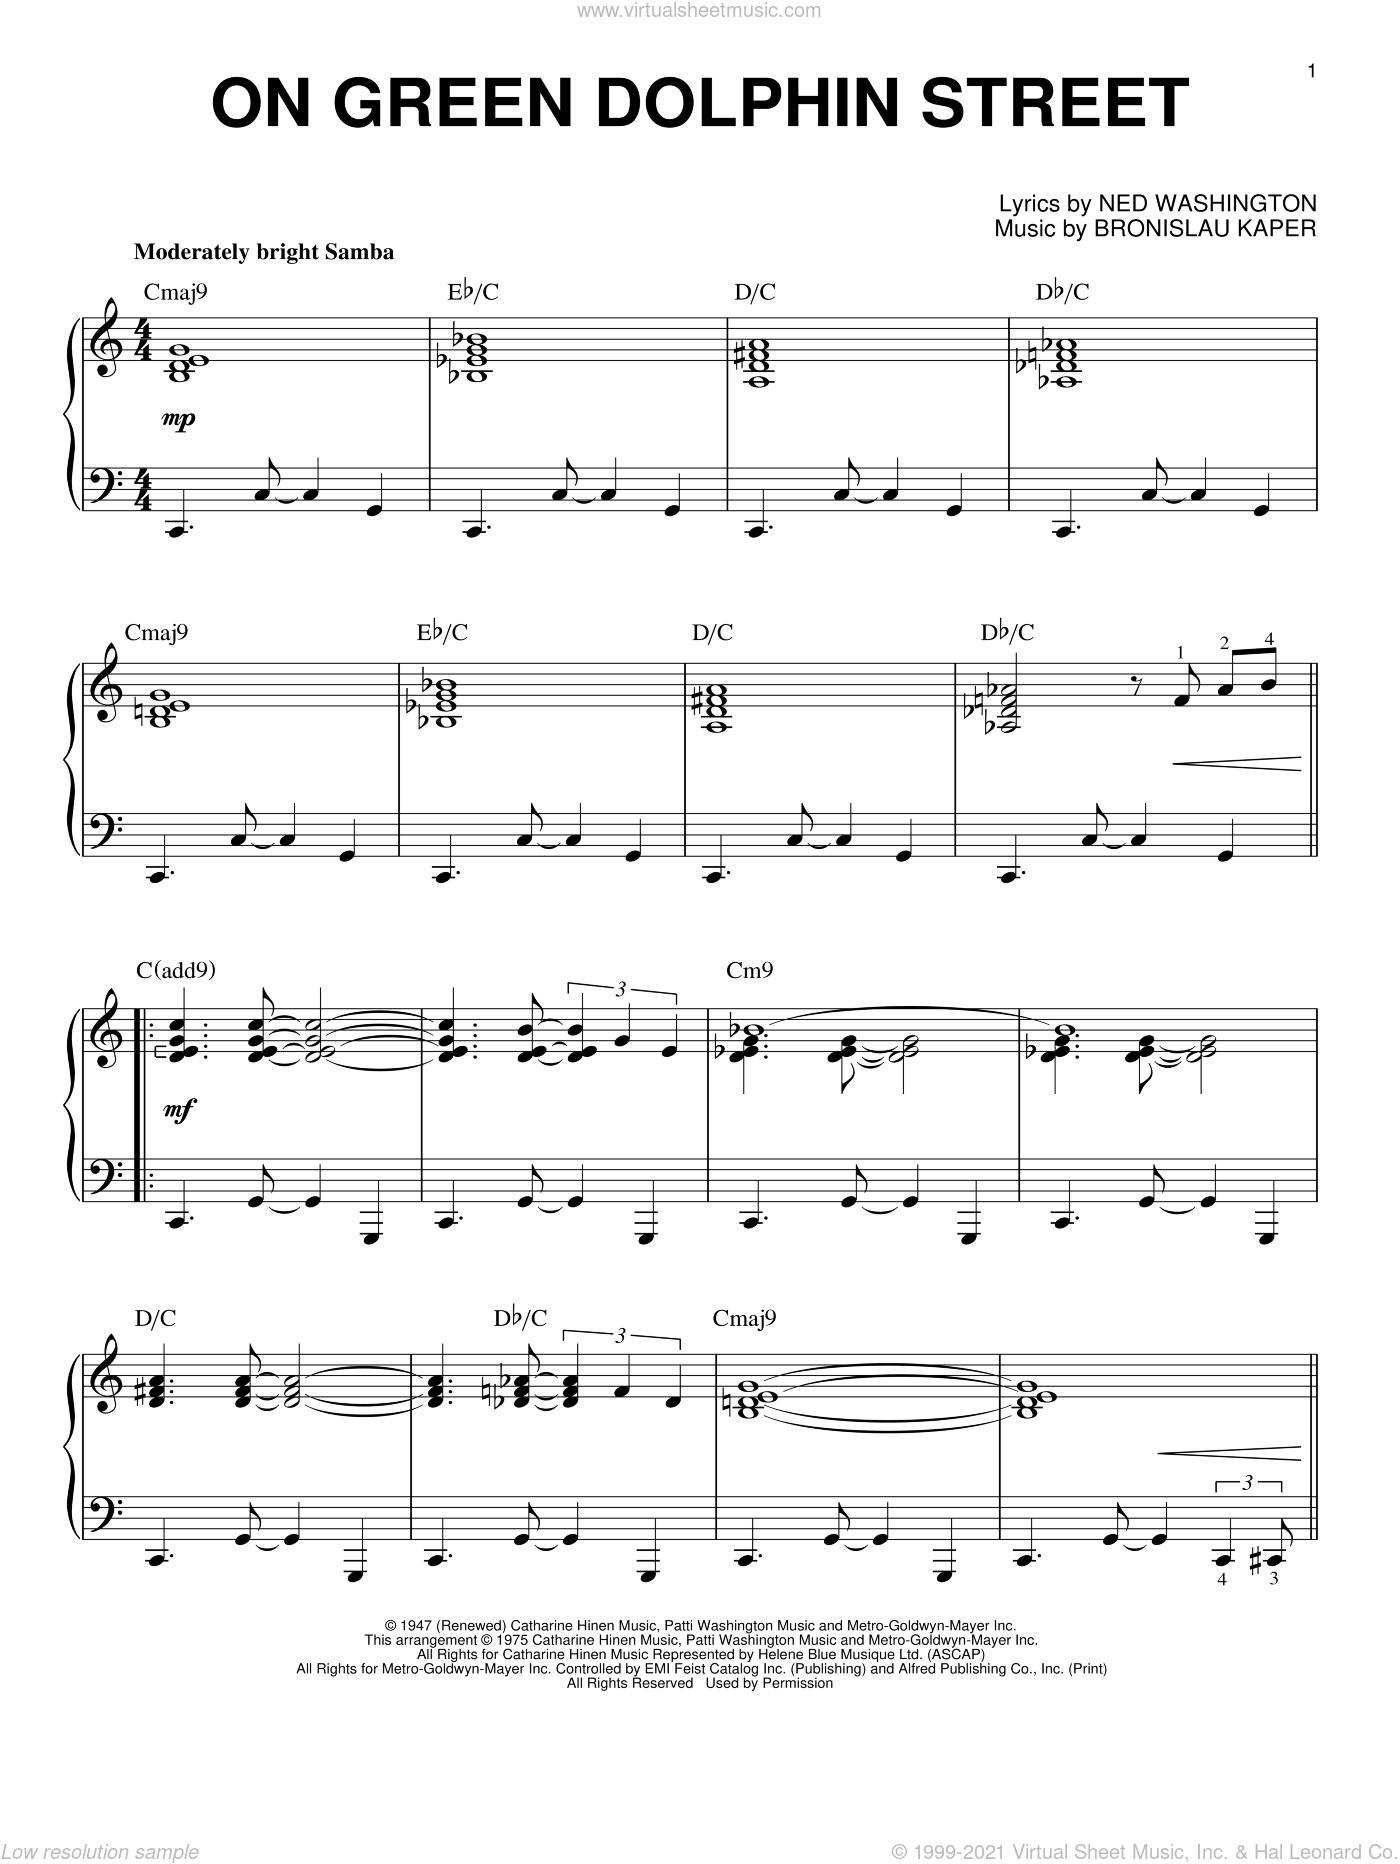 On Green Dolphin Street sheet music for piano solo by Miles Davis, Bill Evans, Bronislau Kaper and Ned Washington, intermediate skill level